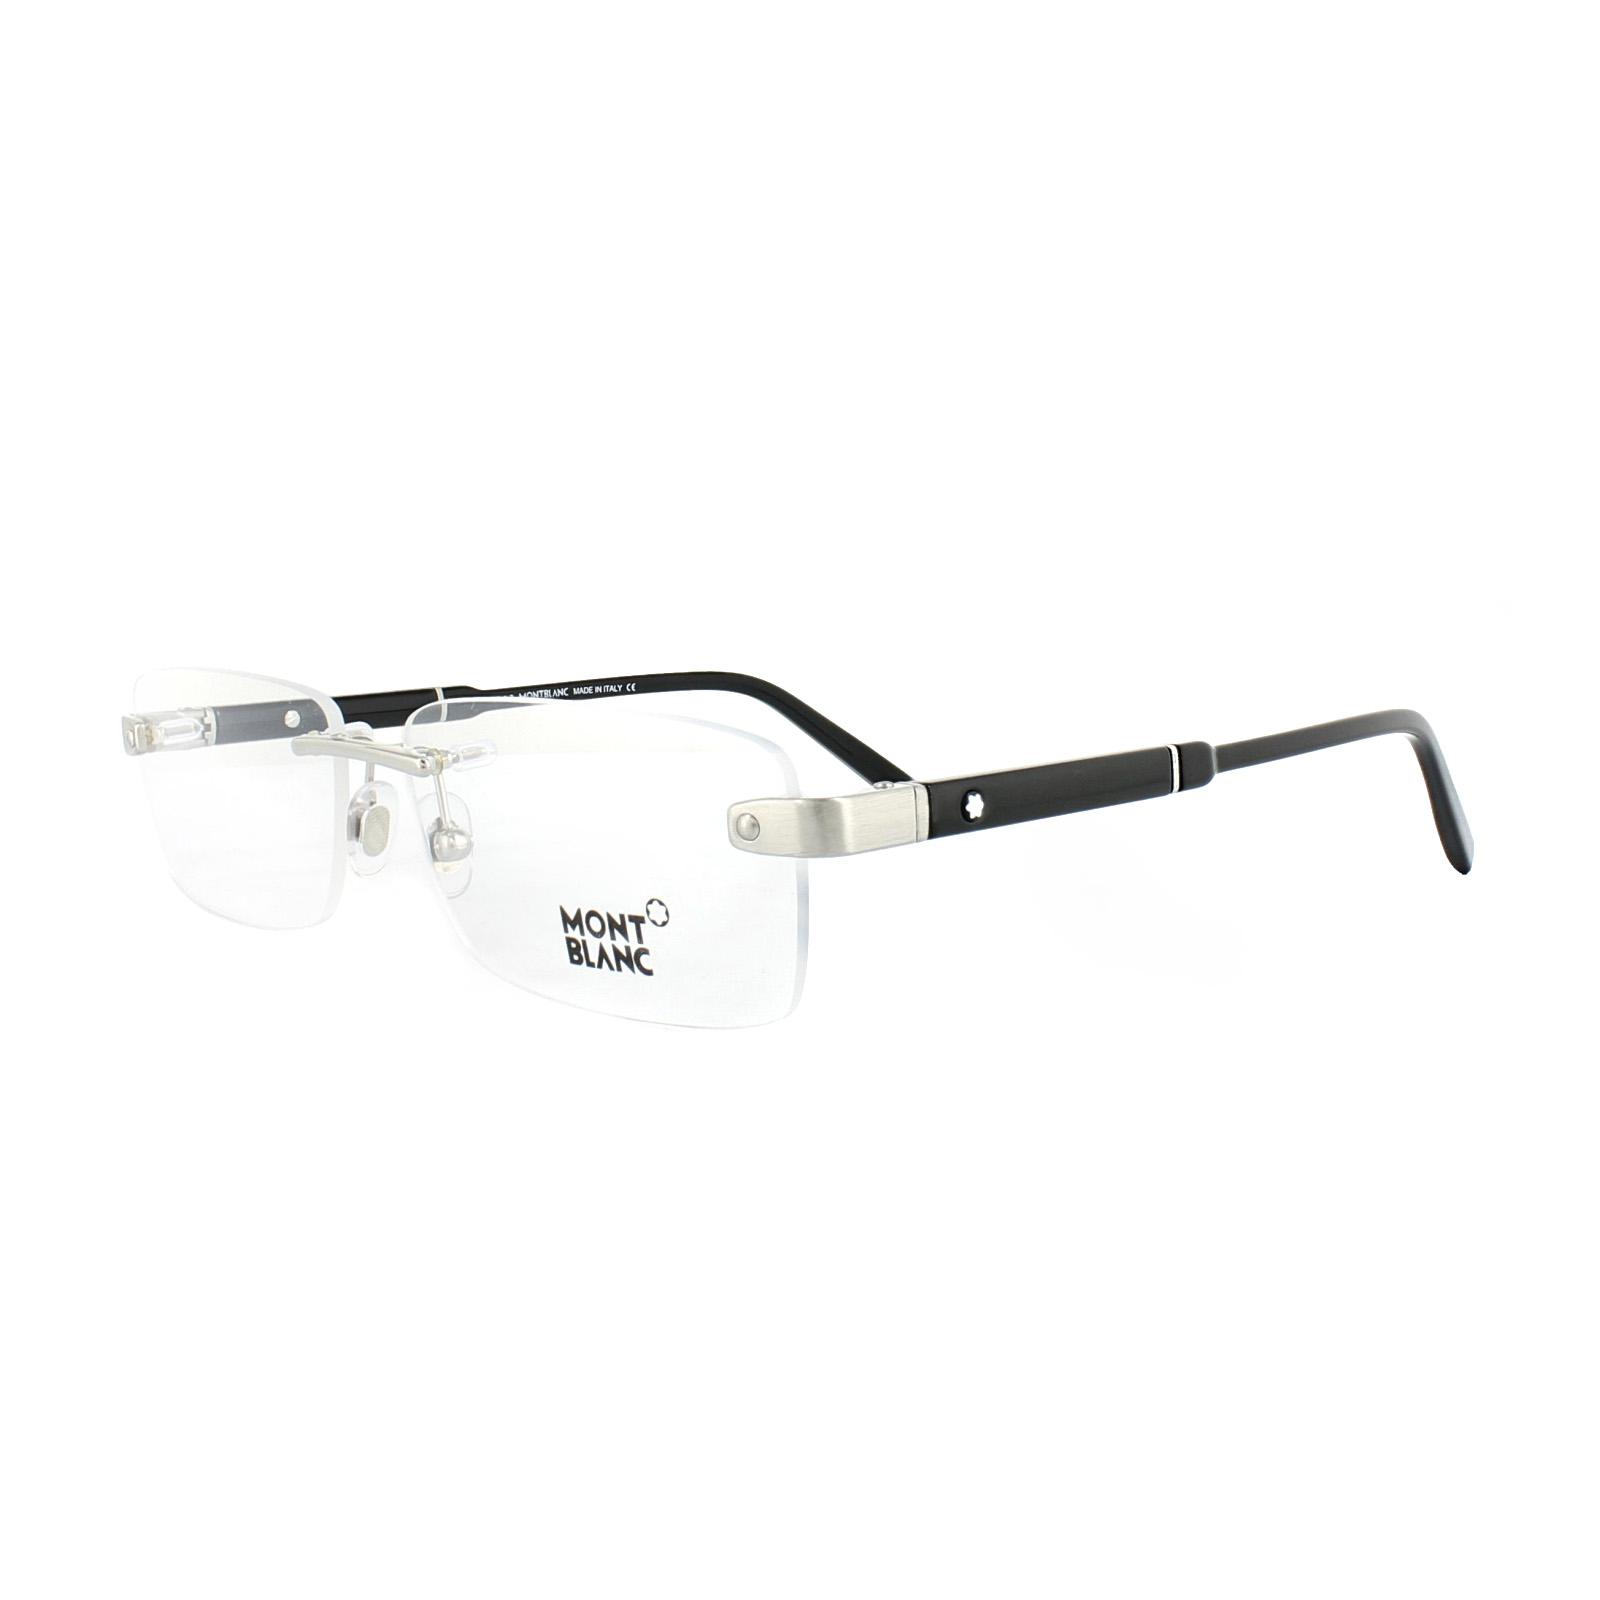 711804e42d2 Sentinel Mont Blanc Glasses Frames MB0617 016 Shiny Palladium Black